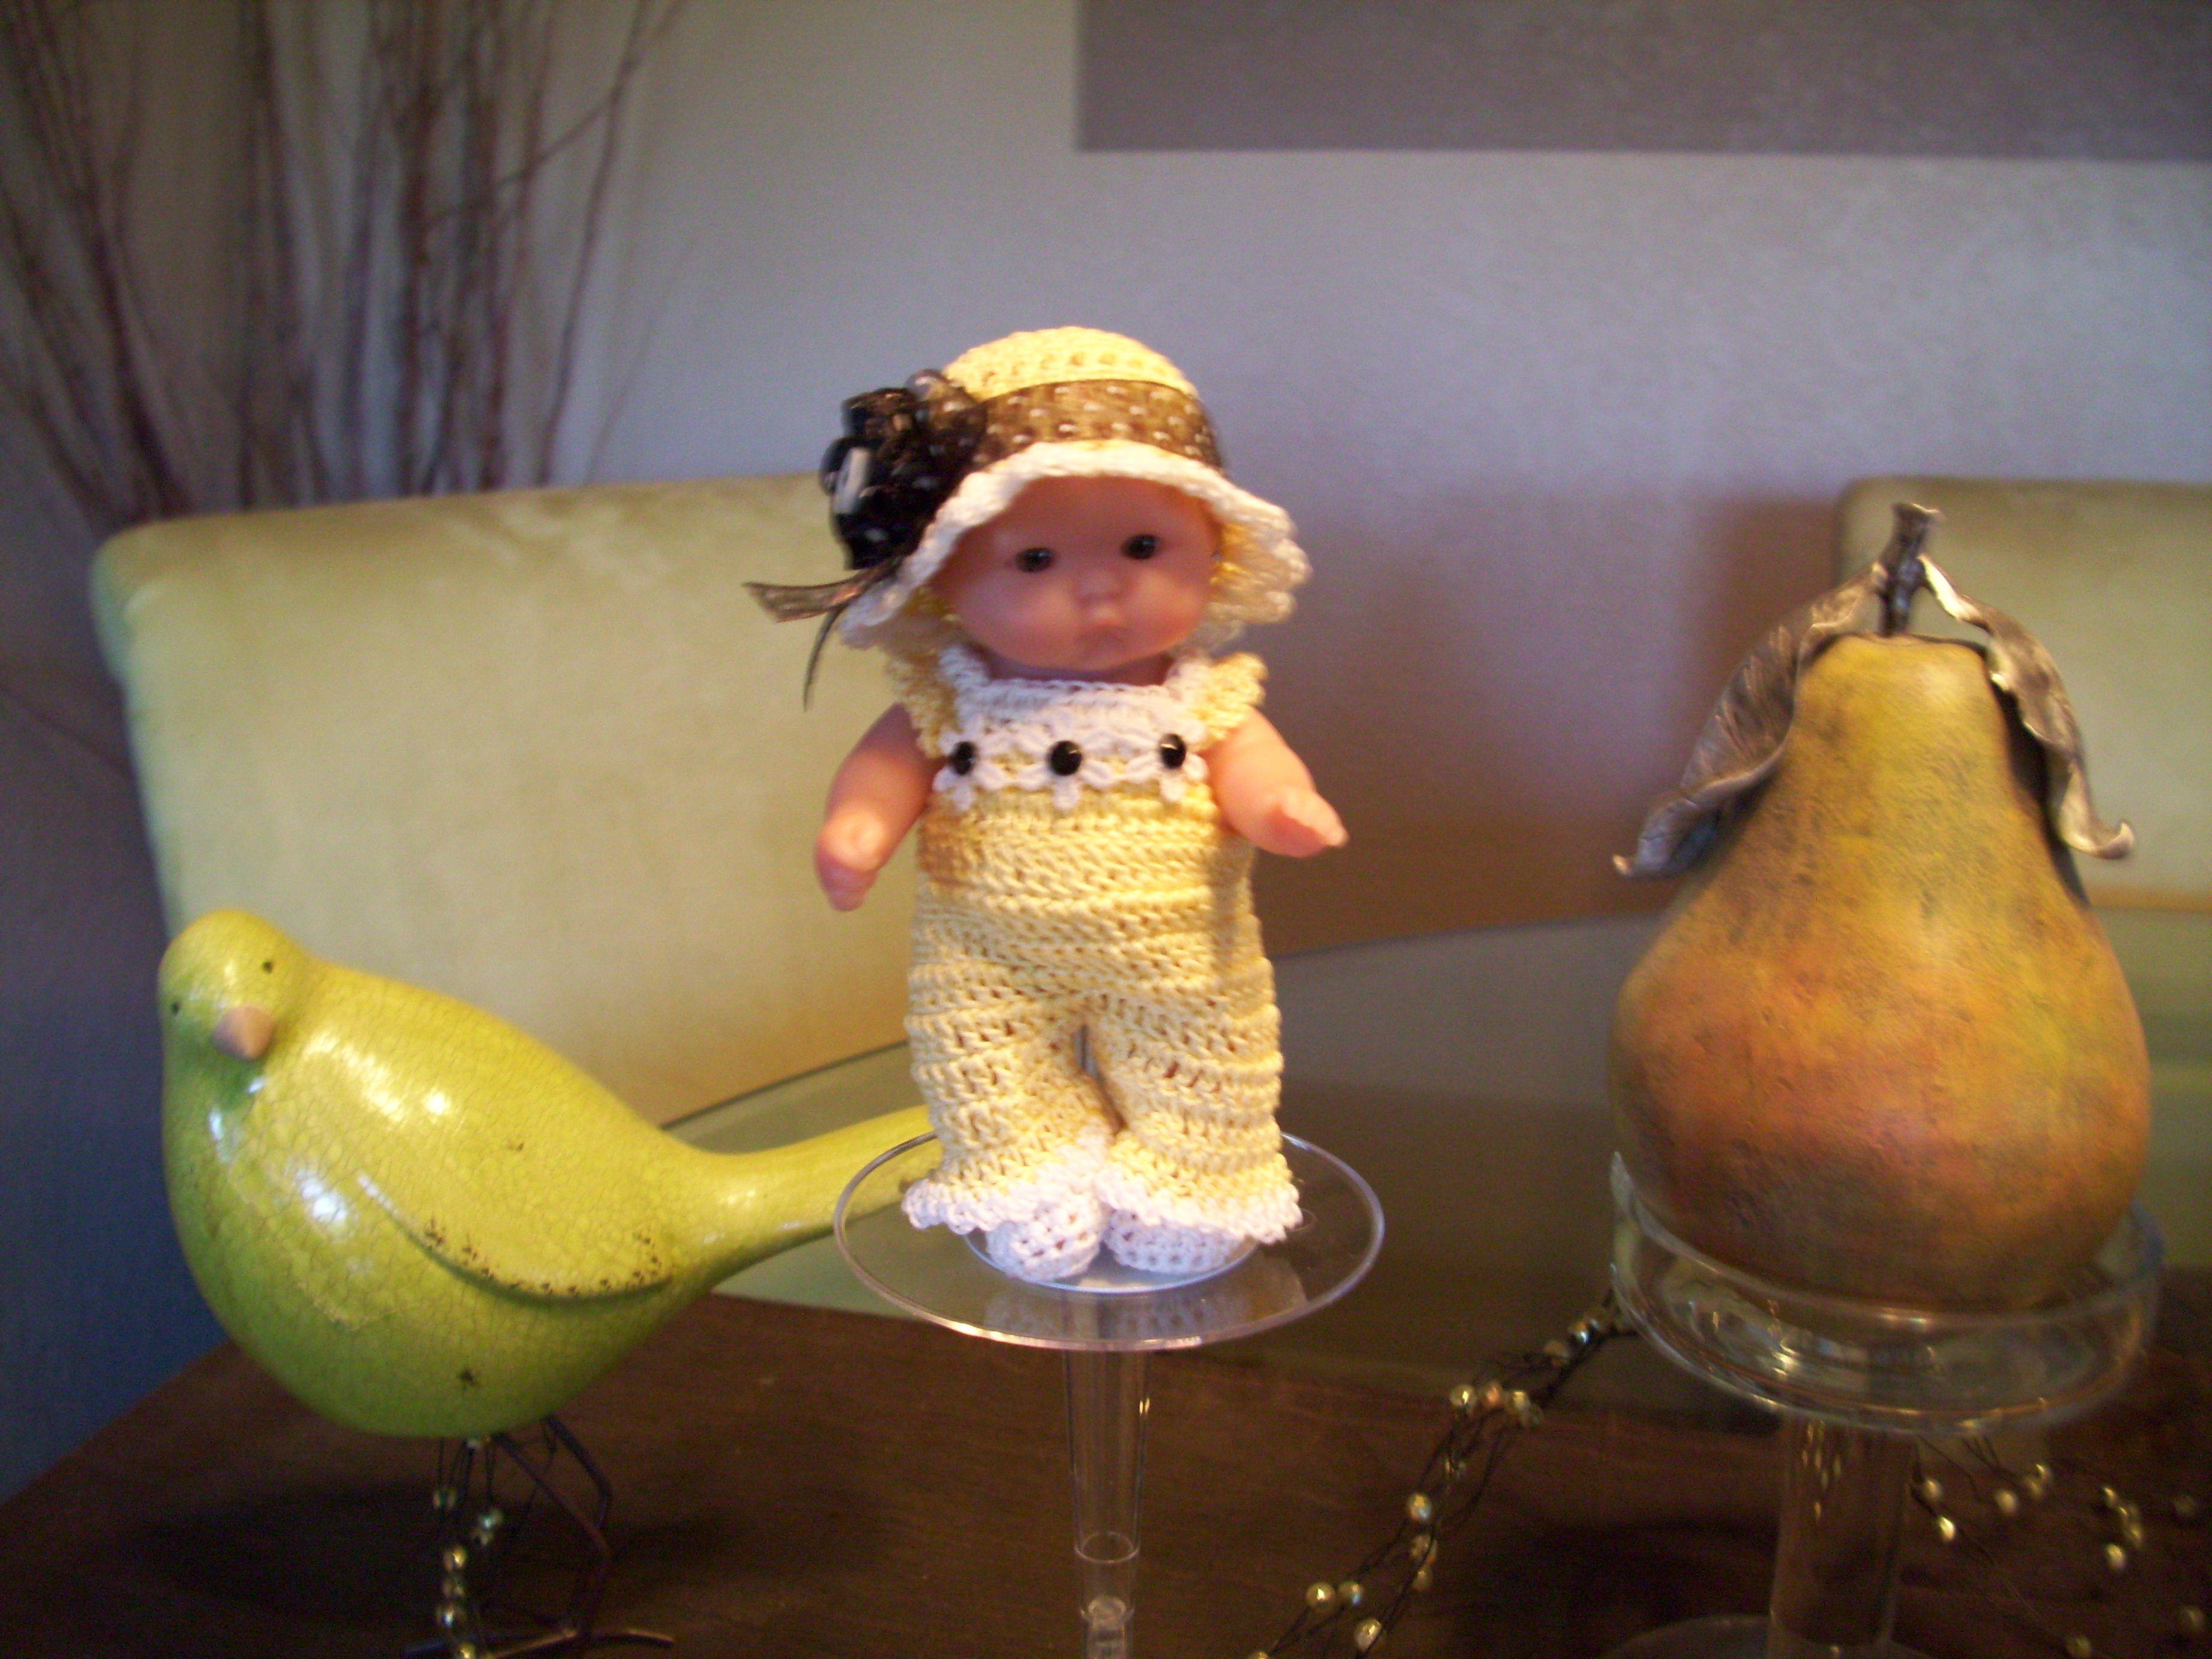 "Berenguer 5"" Baby Dolls - Sunshine girl in jump suit. #78"